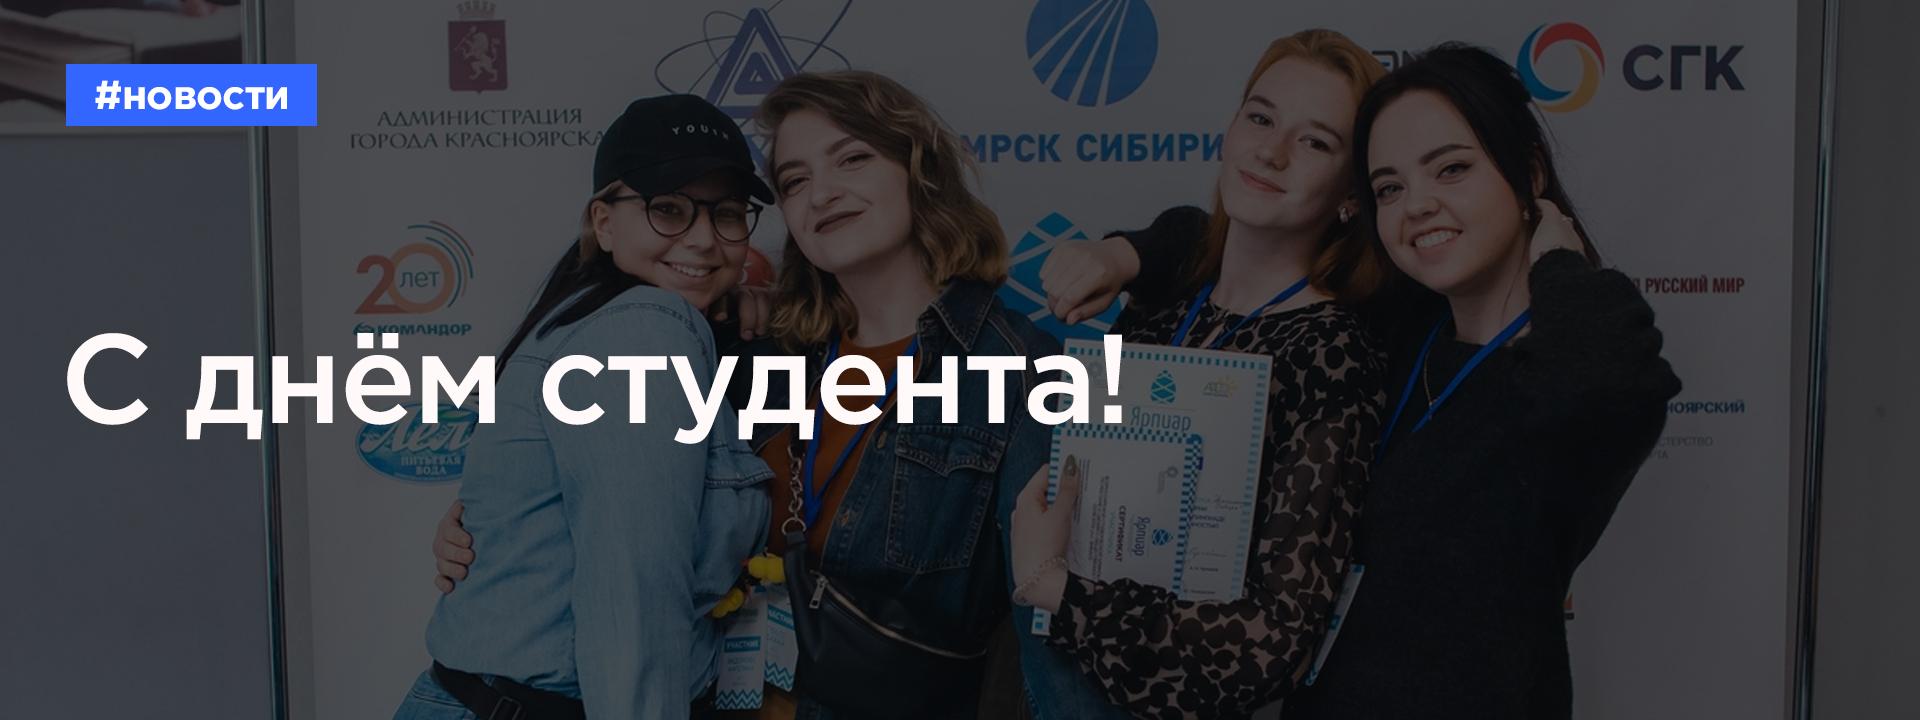 novosti_kopia